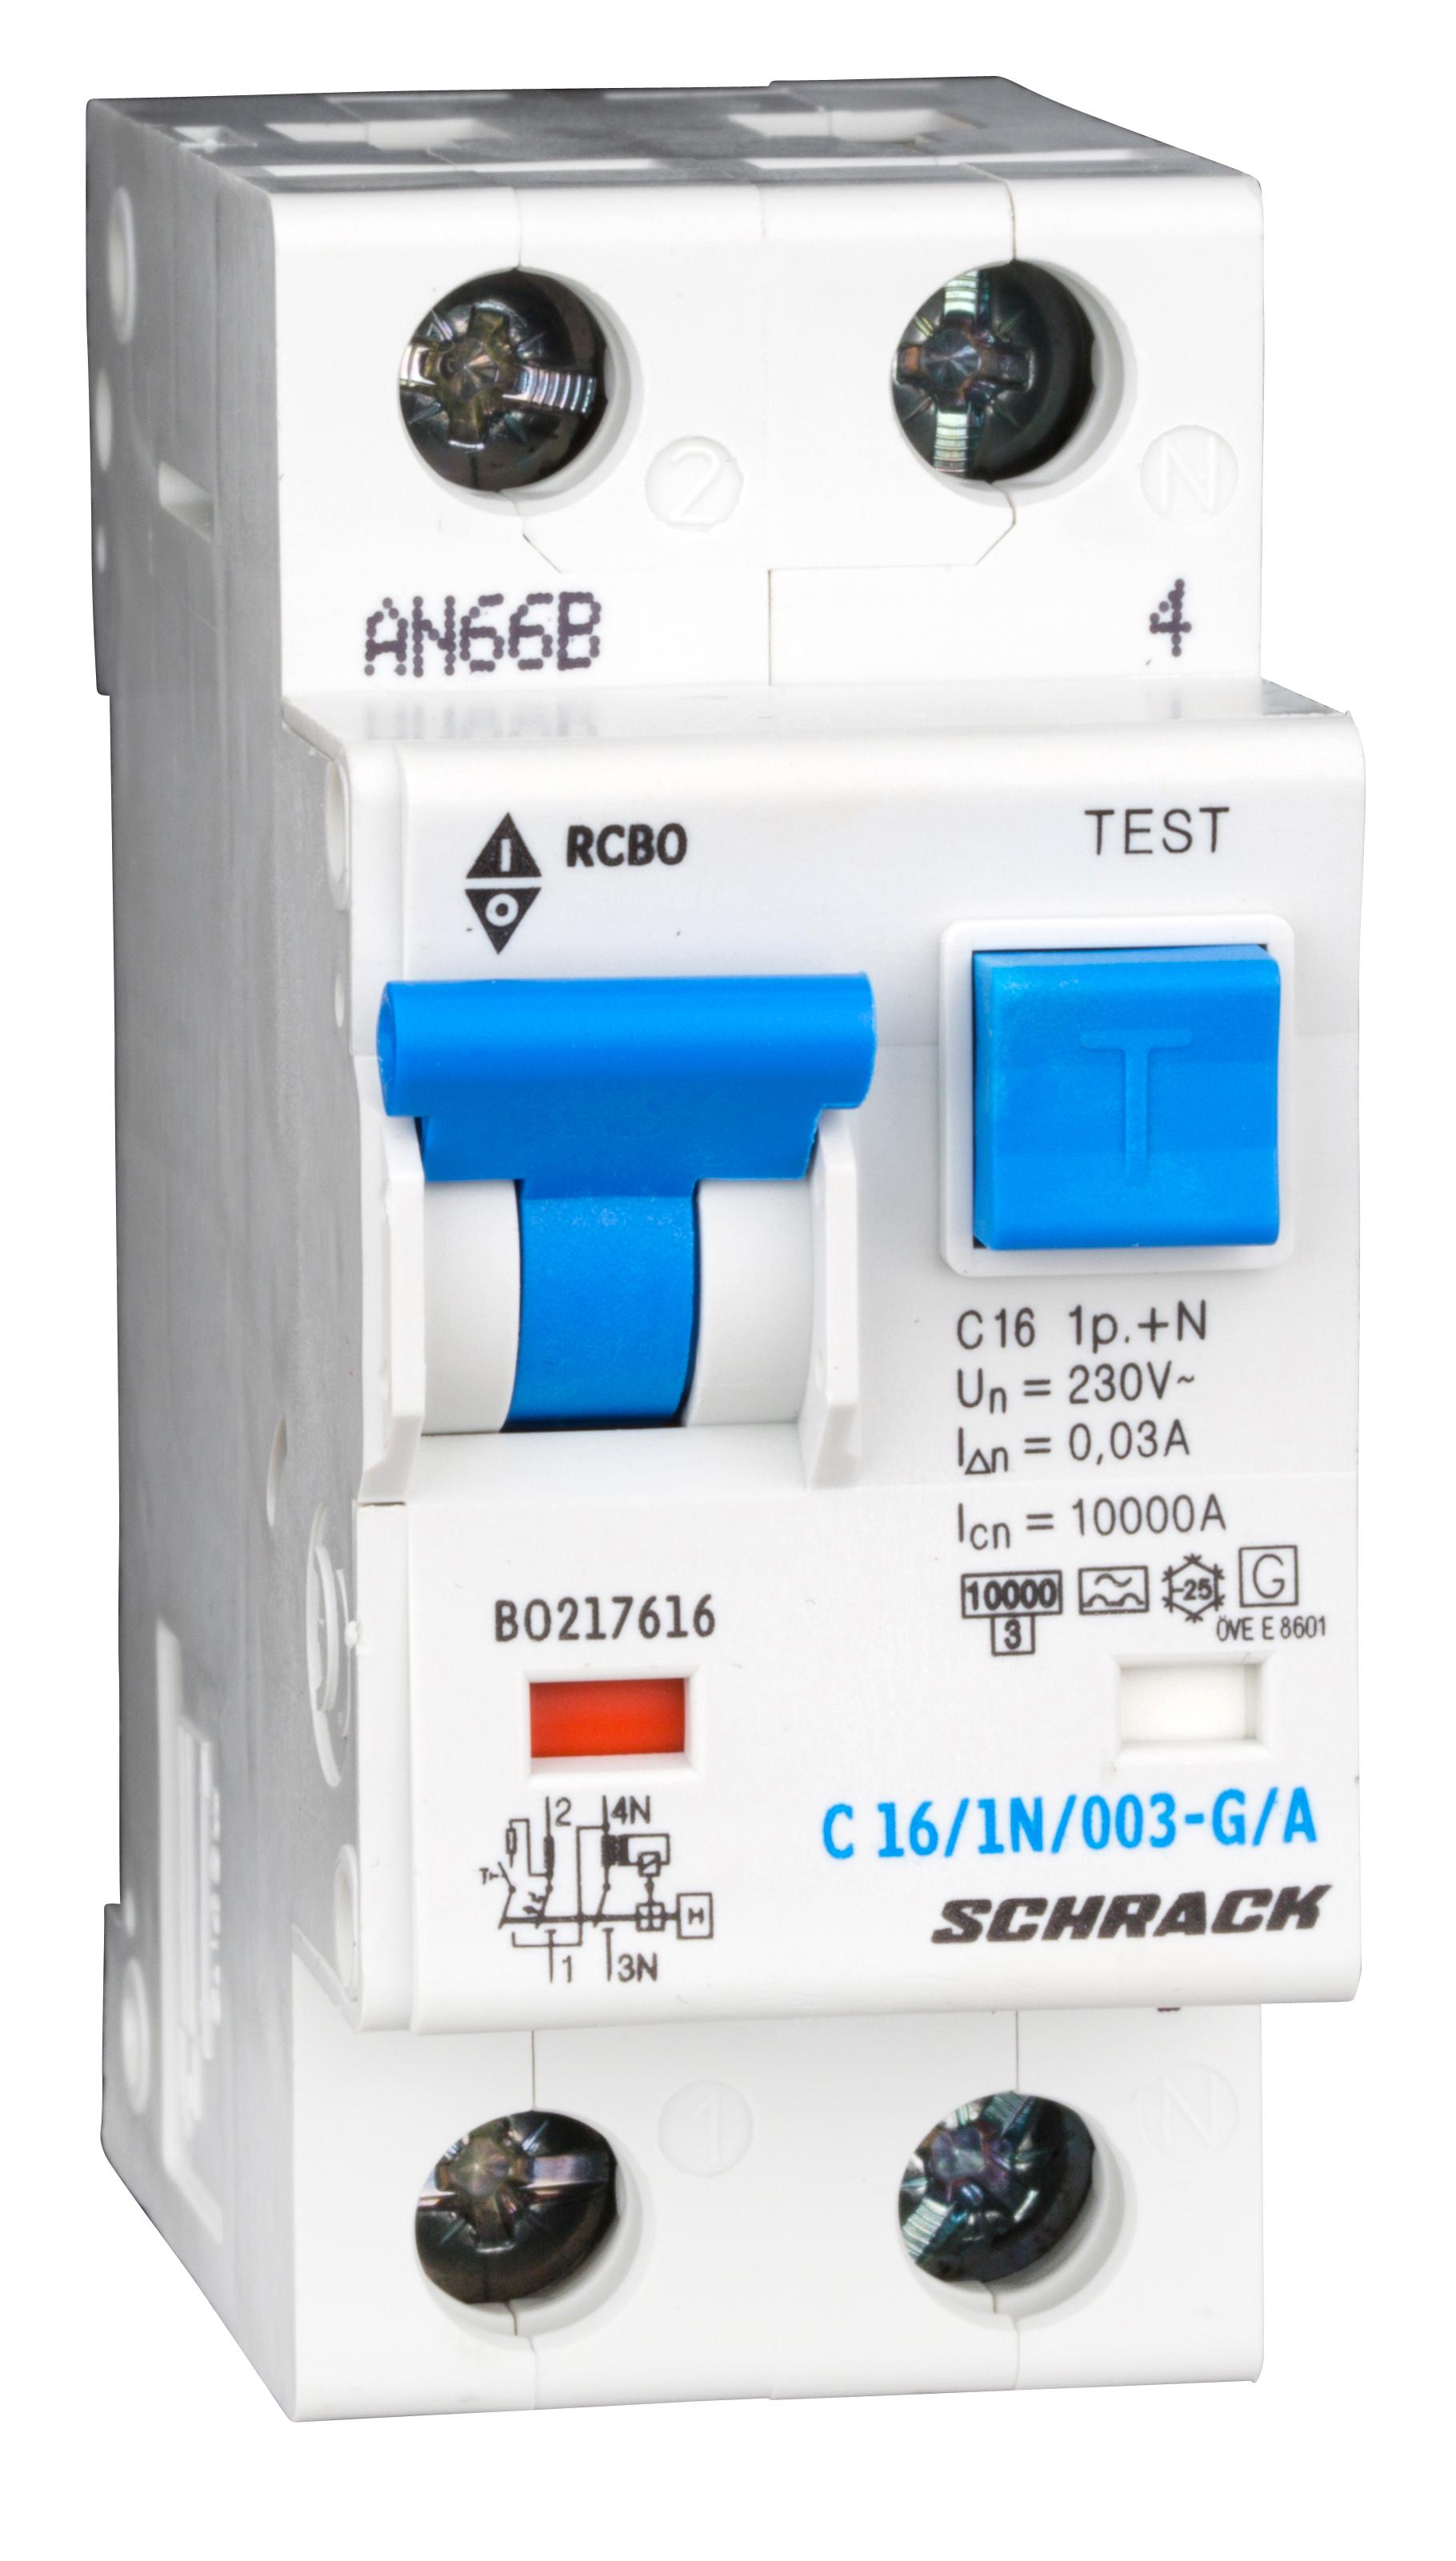 1 Stk LS-FI-Schalter,Kennl. C, 16A,30mA,1-polig+N, Bauart G,Typ A BO217616--